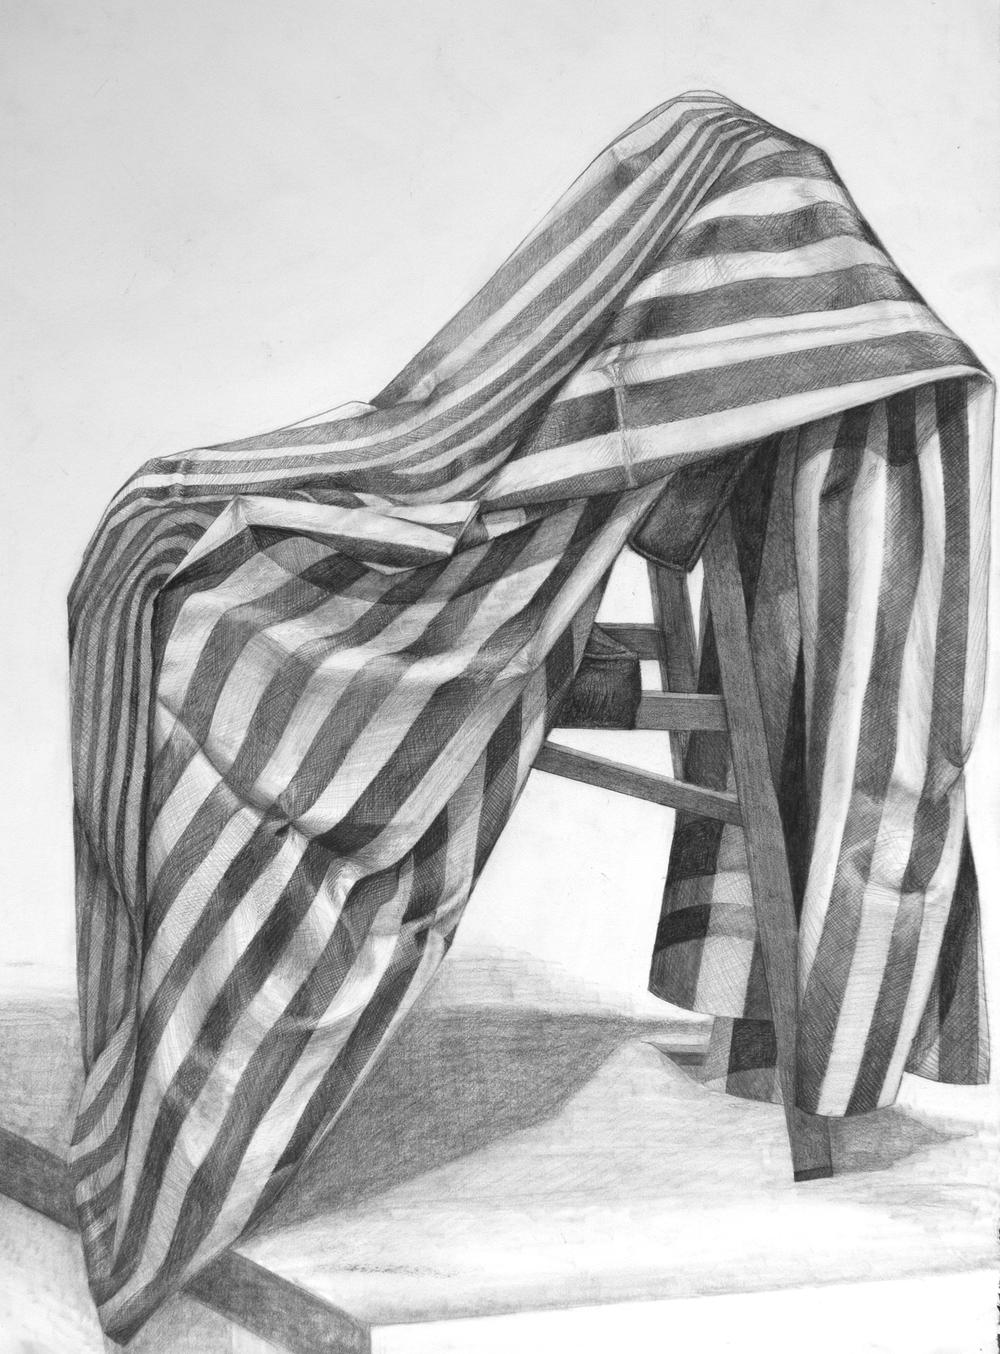 """Chair study"" - Graphite pencils"